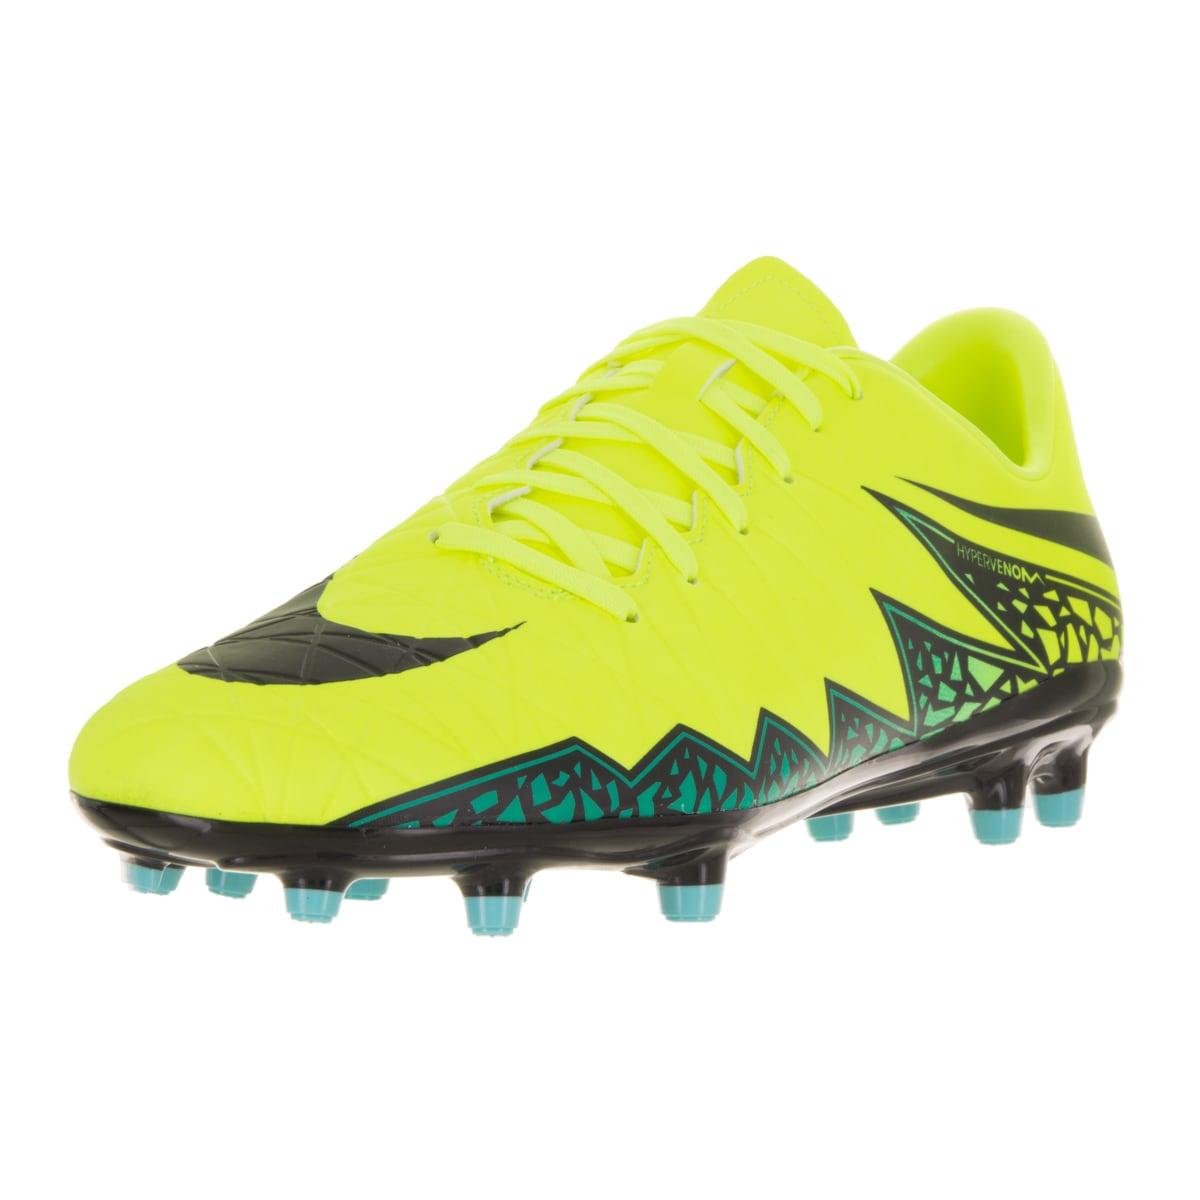 55c908087a1 Shop Nike Men s Hypervenom Phelon II FG Volt Black Hyper Turq Clr Jade Soccer  Cleat - Free Shipping Today - Overstock - 13394877